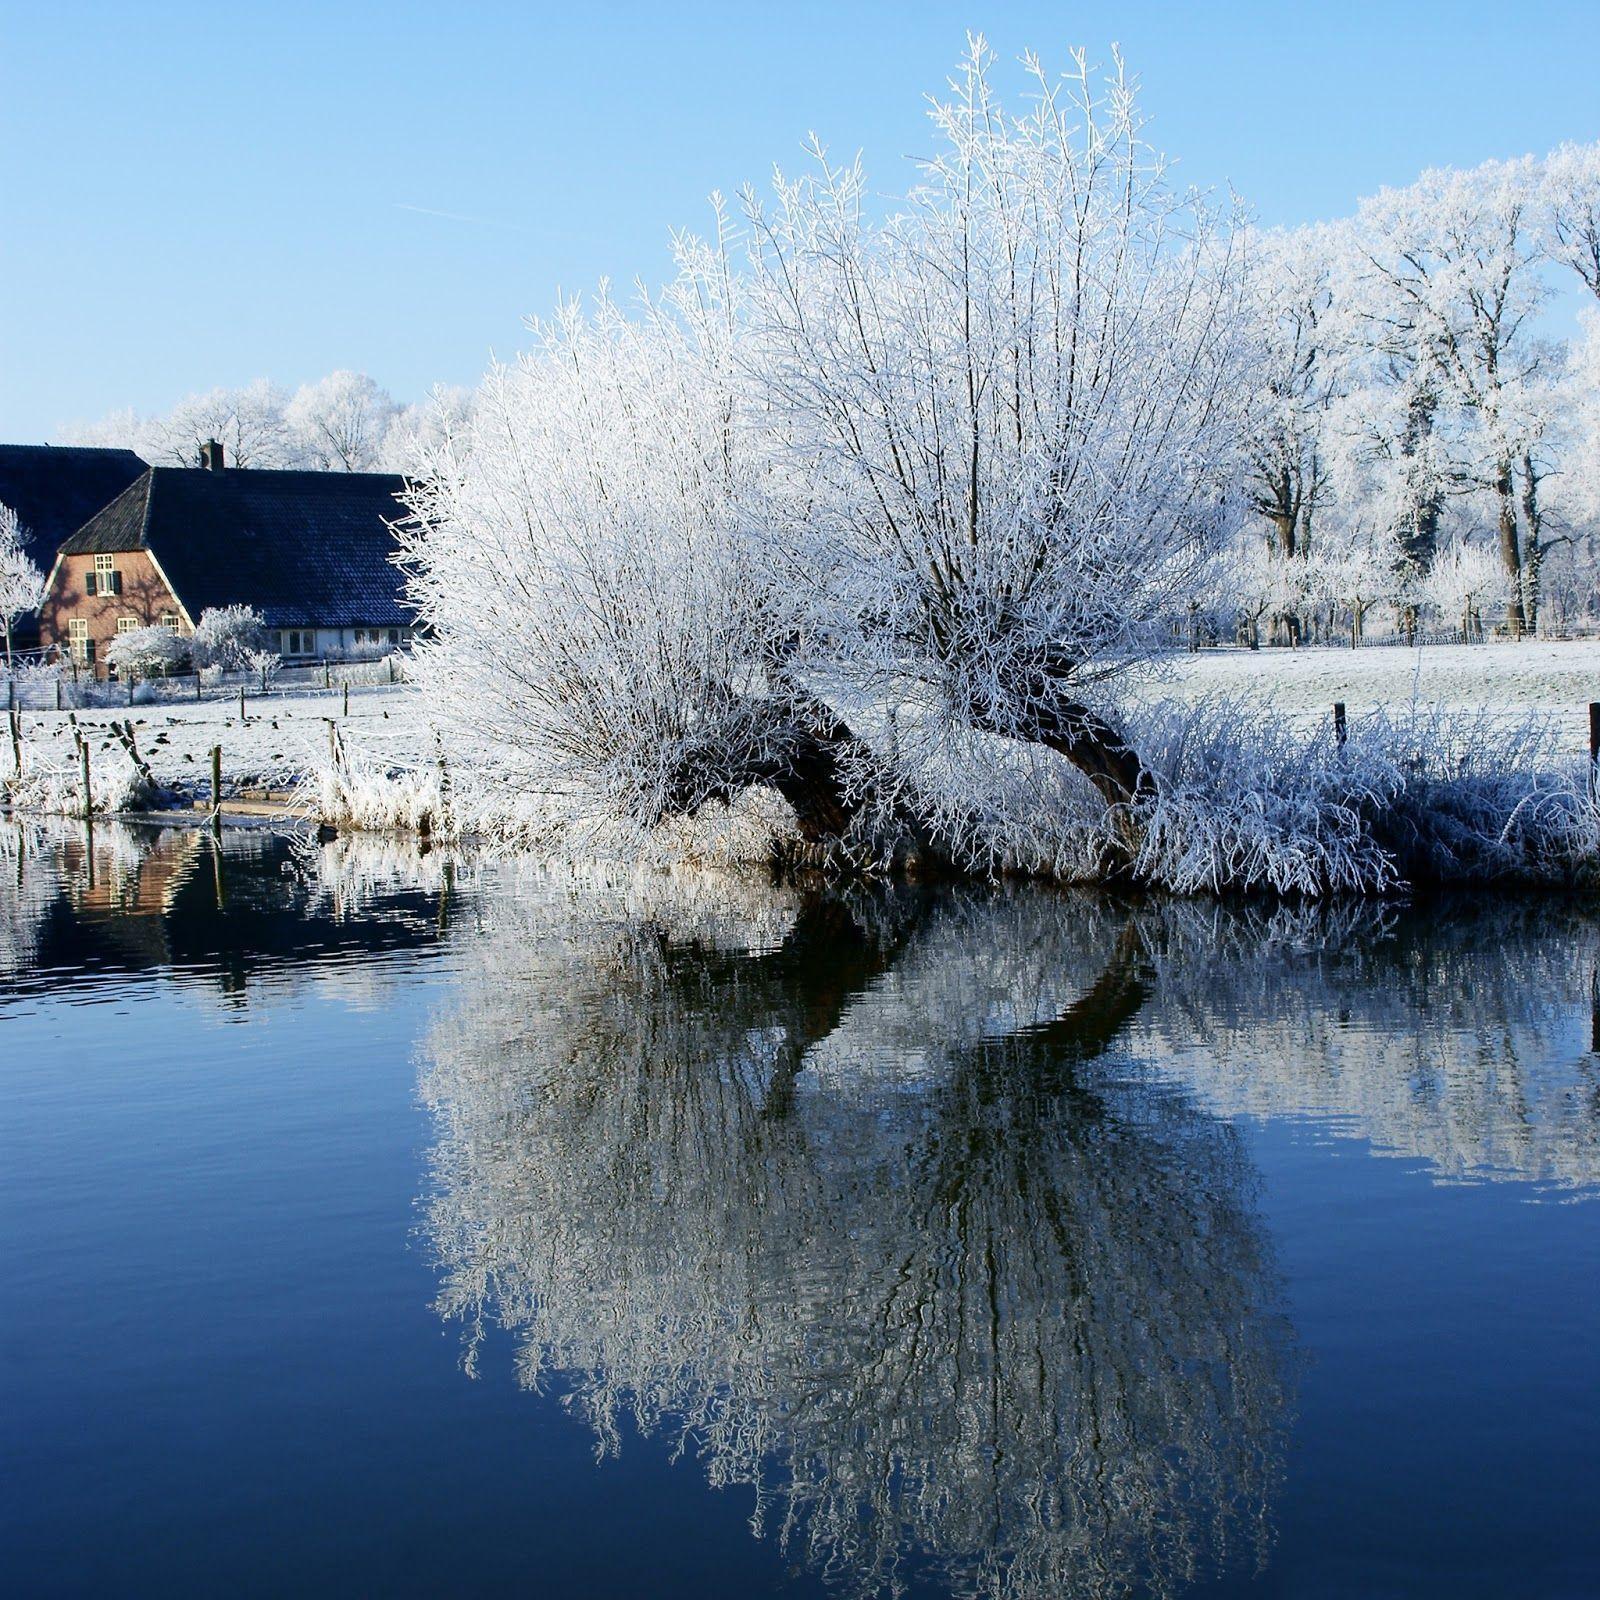 Winter Wallpaper: Winter Themed Wallpapers